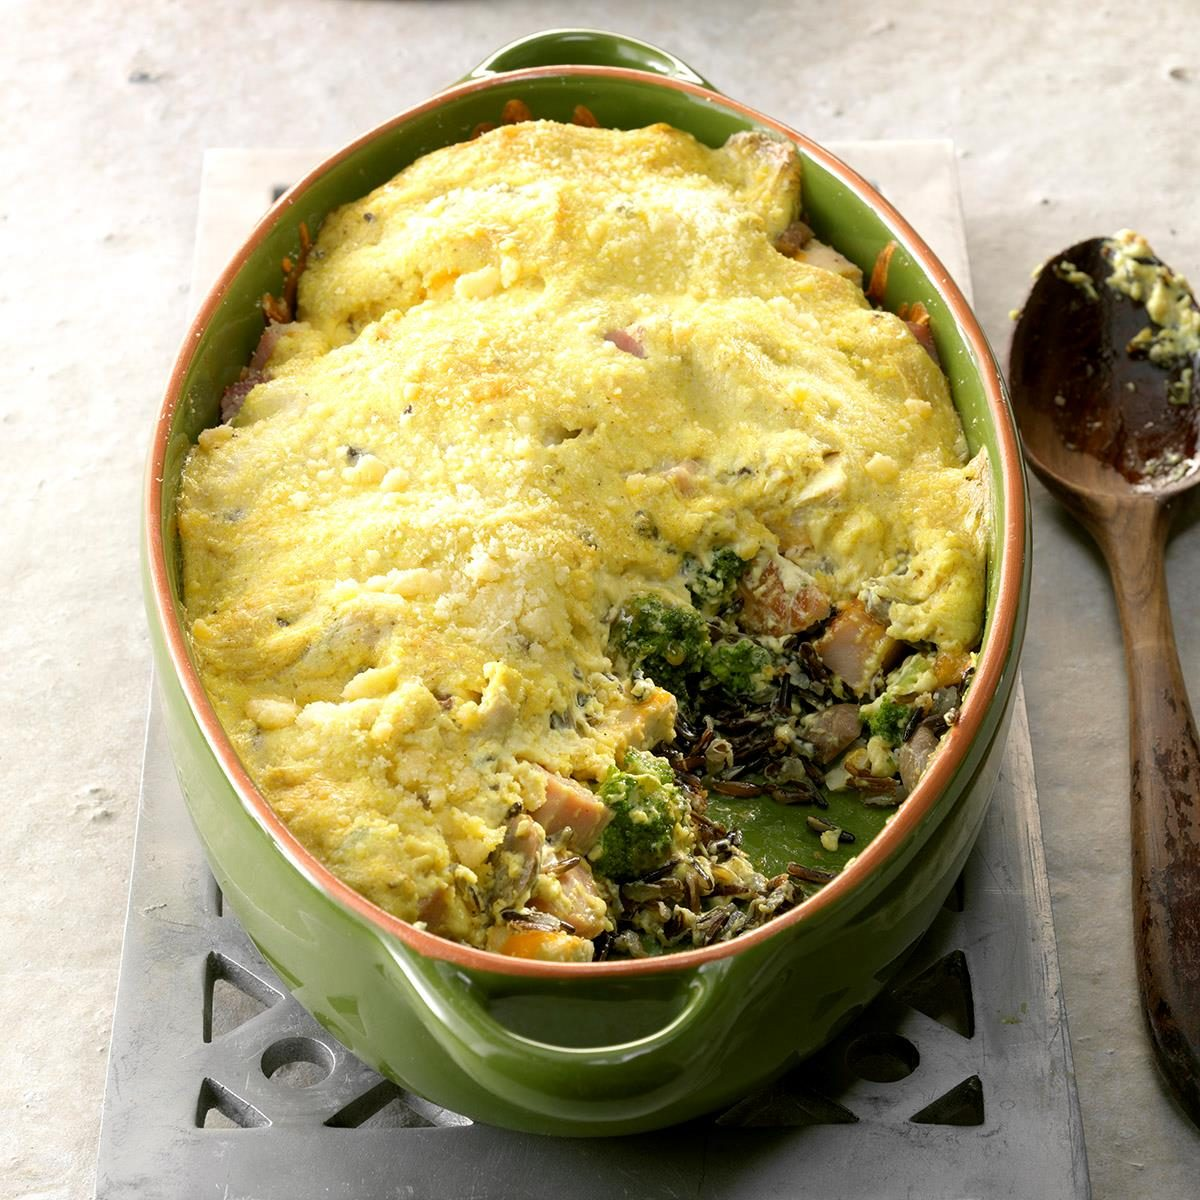 50 Casual Dinner Party Menu Ideas Taste Of Home